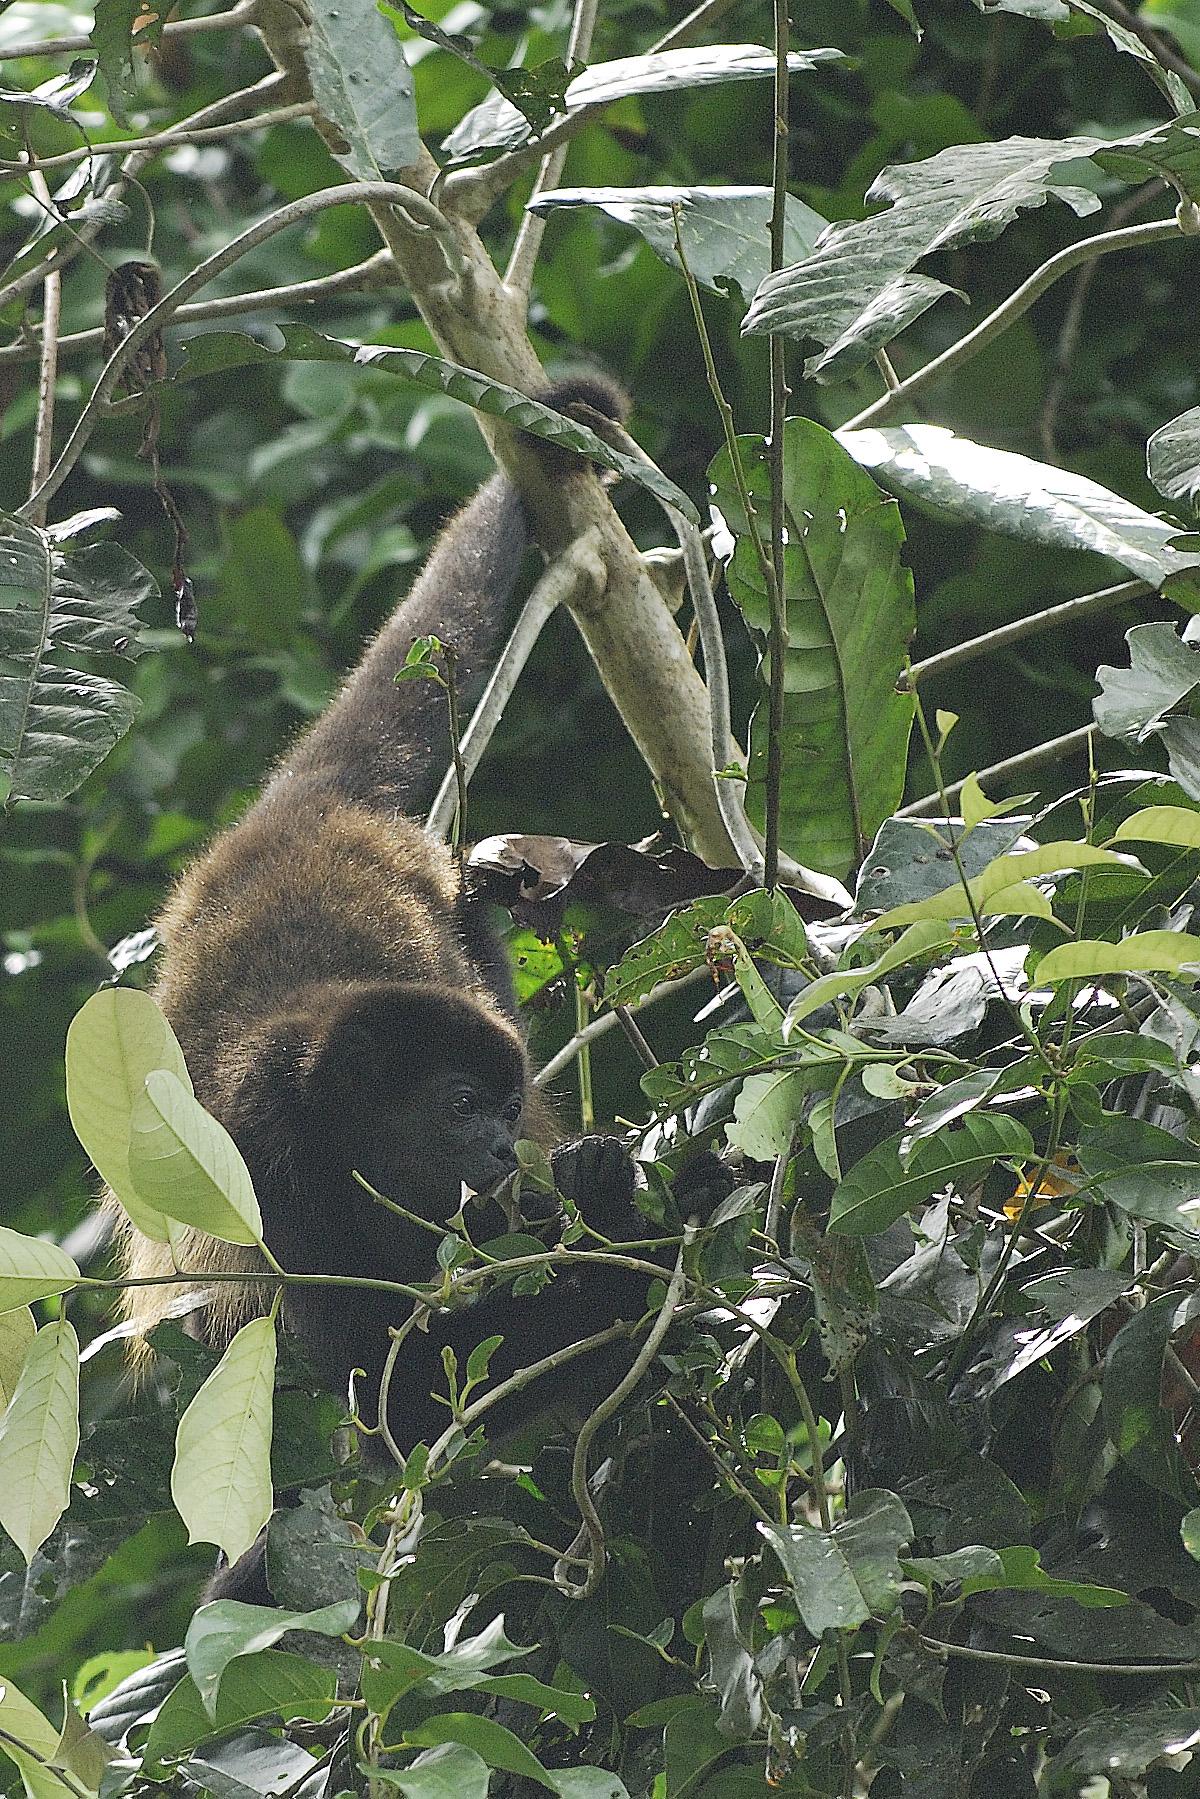 20070630 - Costa Rica - 1092.jpg